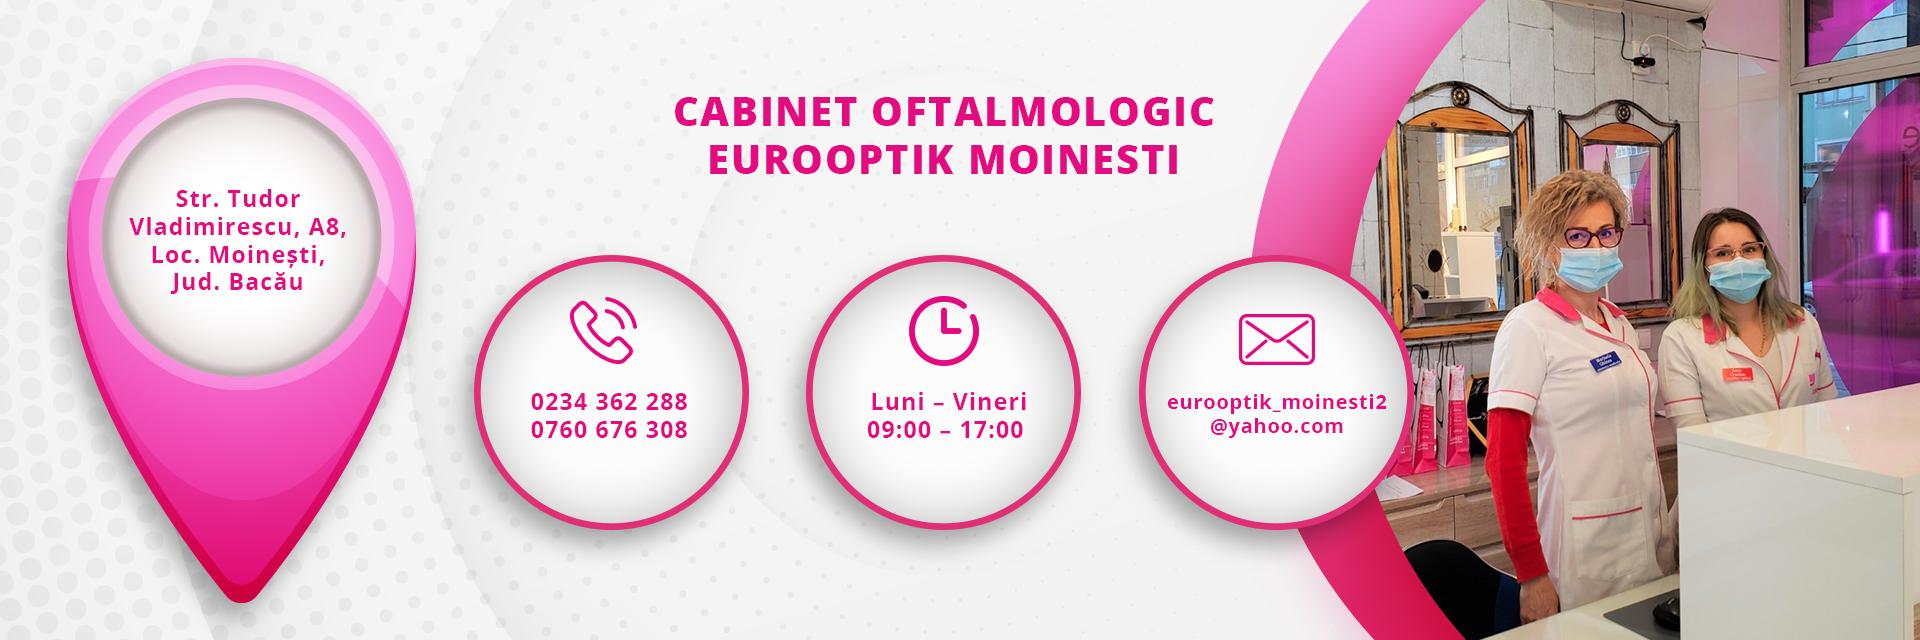 Clinica Oftalmologica Comanesti Eurooptik